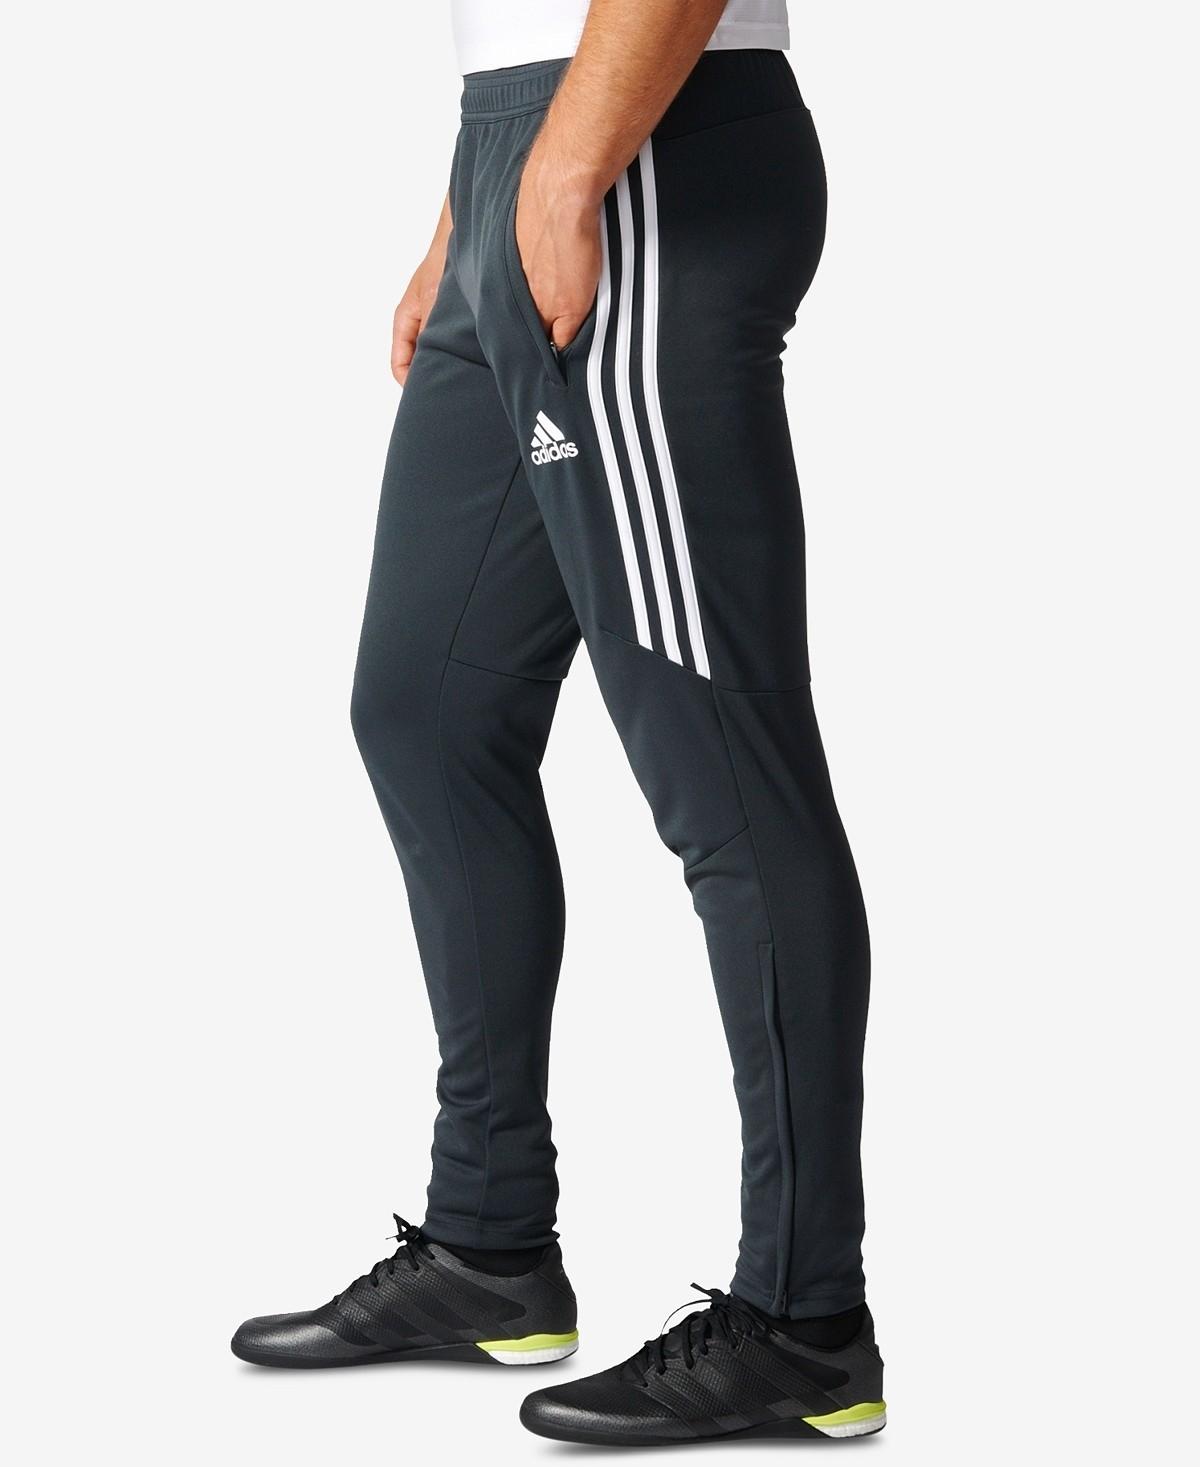 e77a0db1e150 Мужские спортивные штаны Adidas TIRO 17 TRG PNT, тёмно-серый/белый ZAF